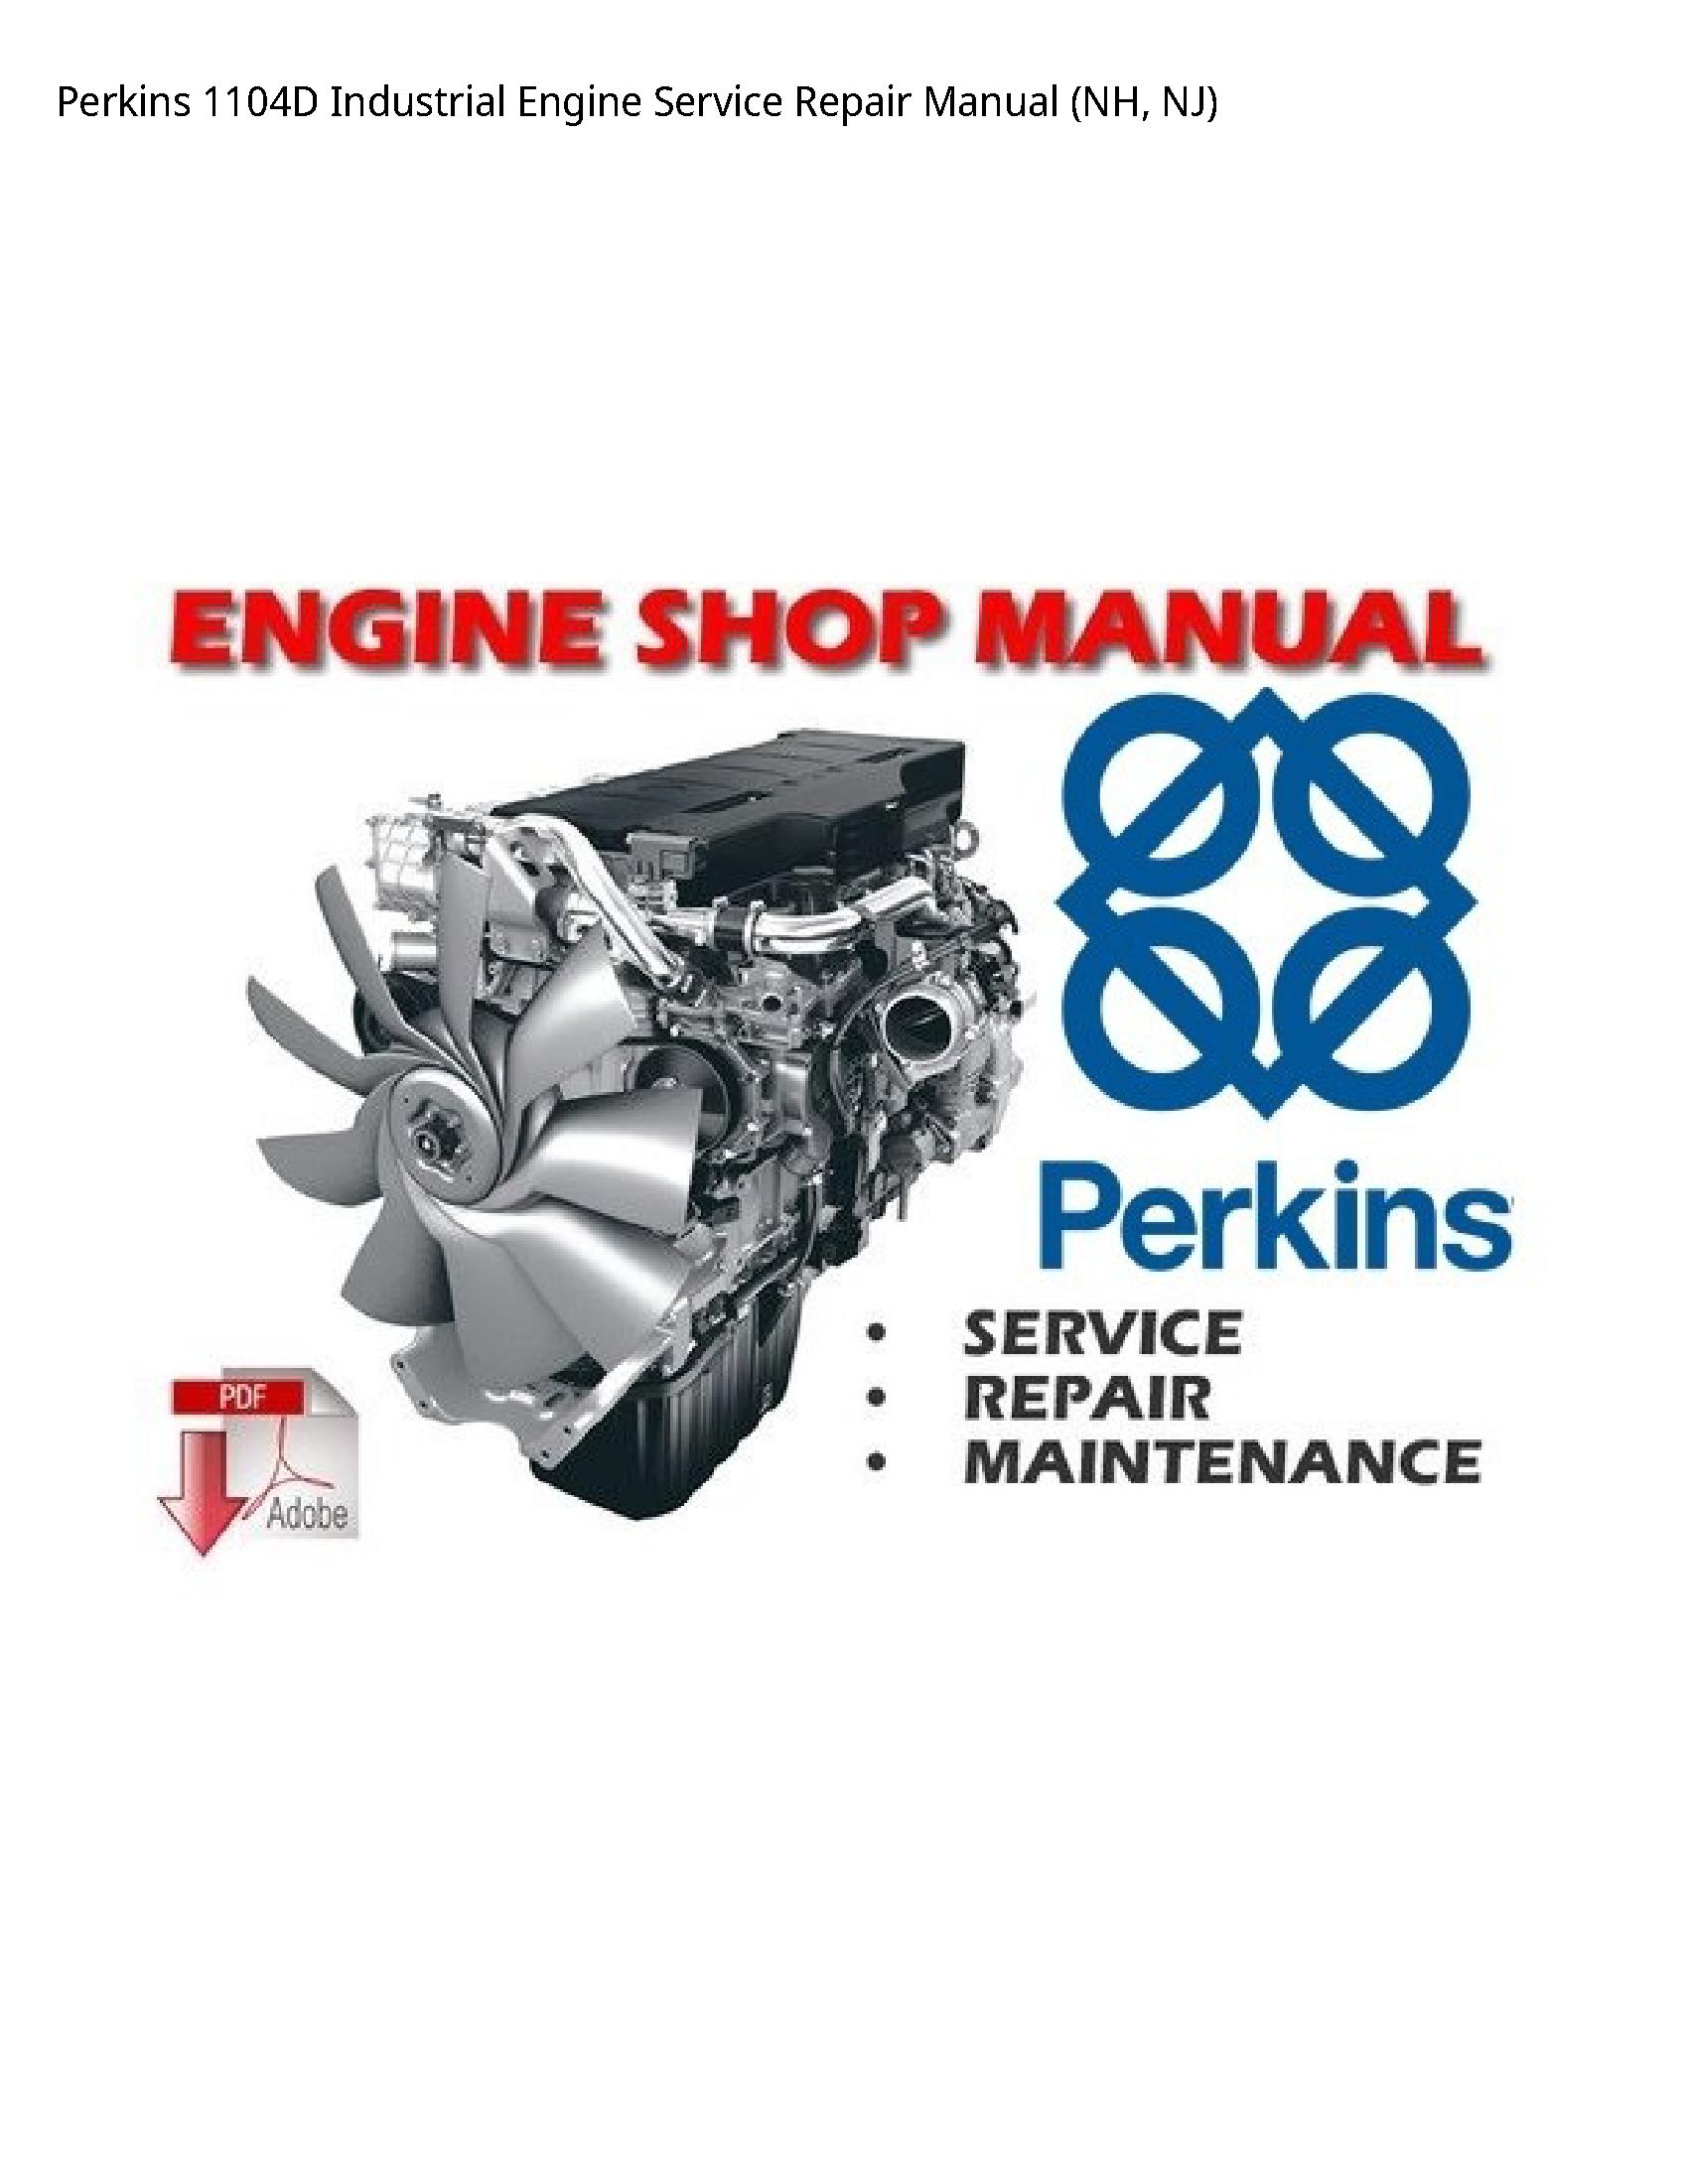 Perkins 1104D Industrial Engine manual